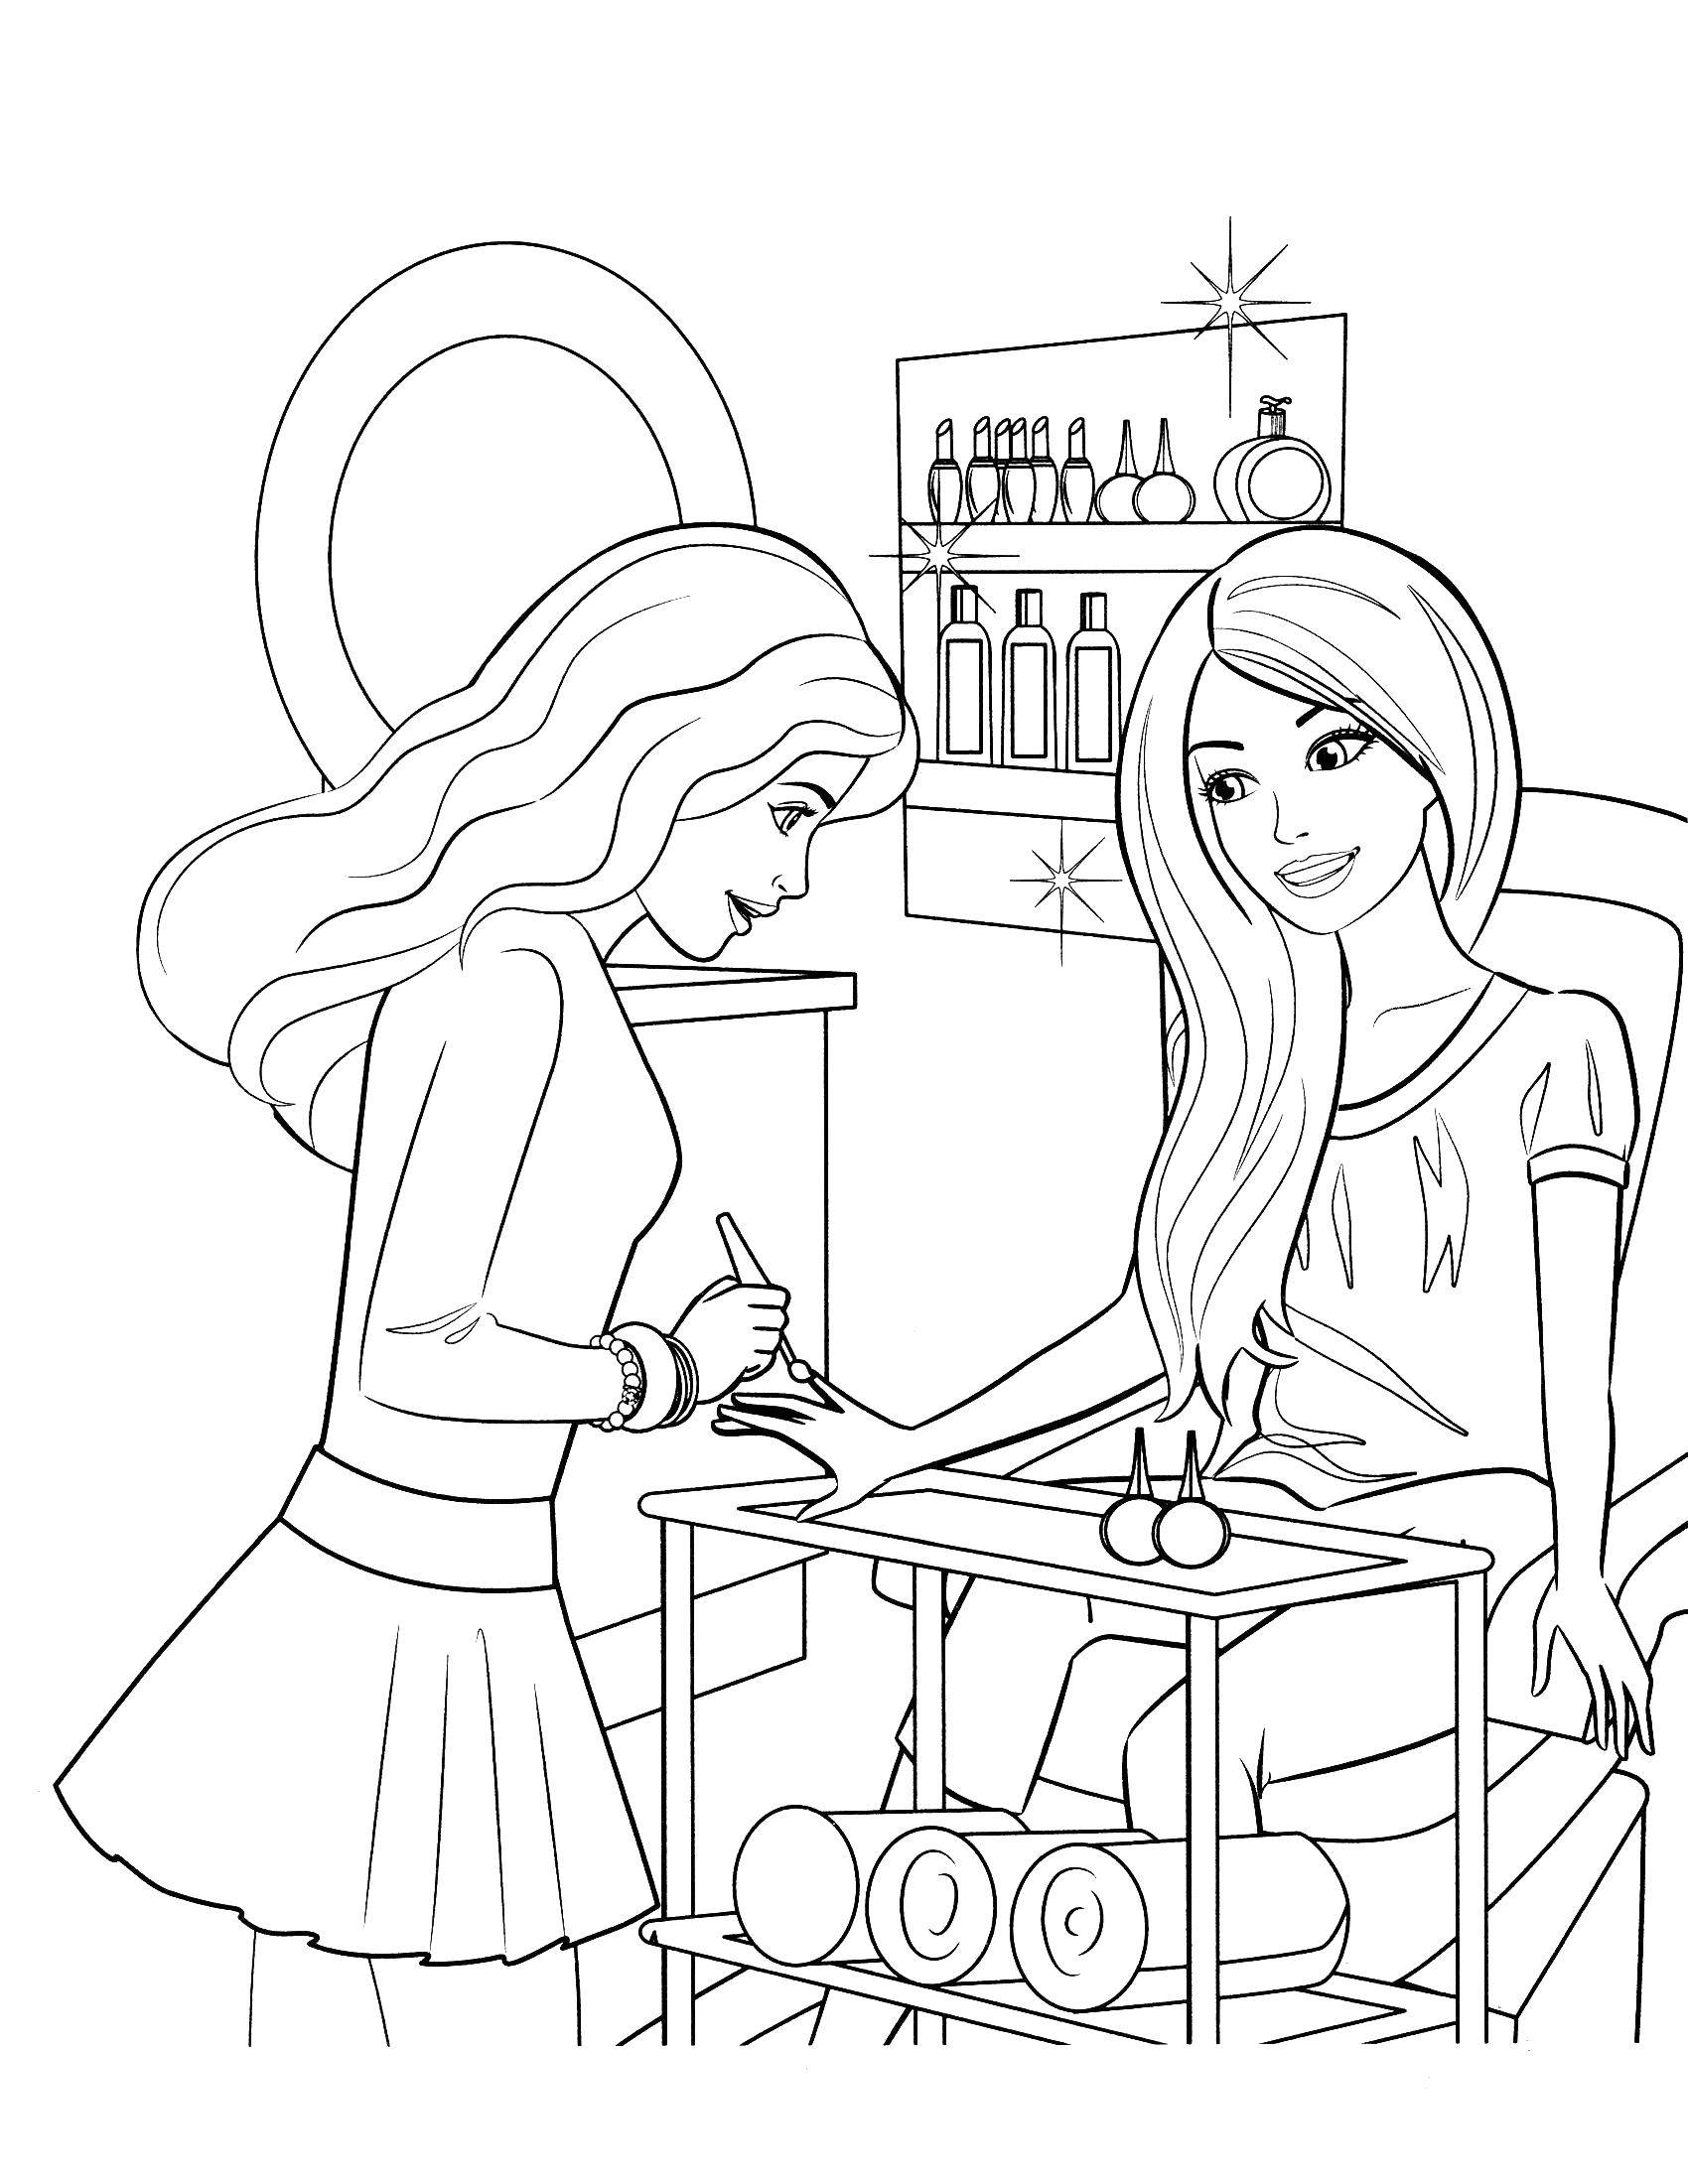 Coloring pages Barbie Скачать .  Распечатать